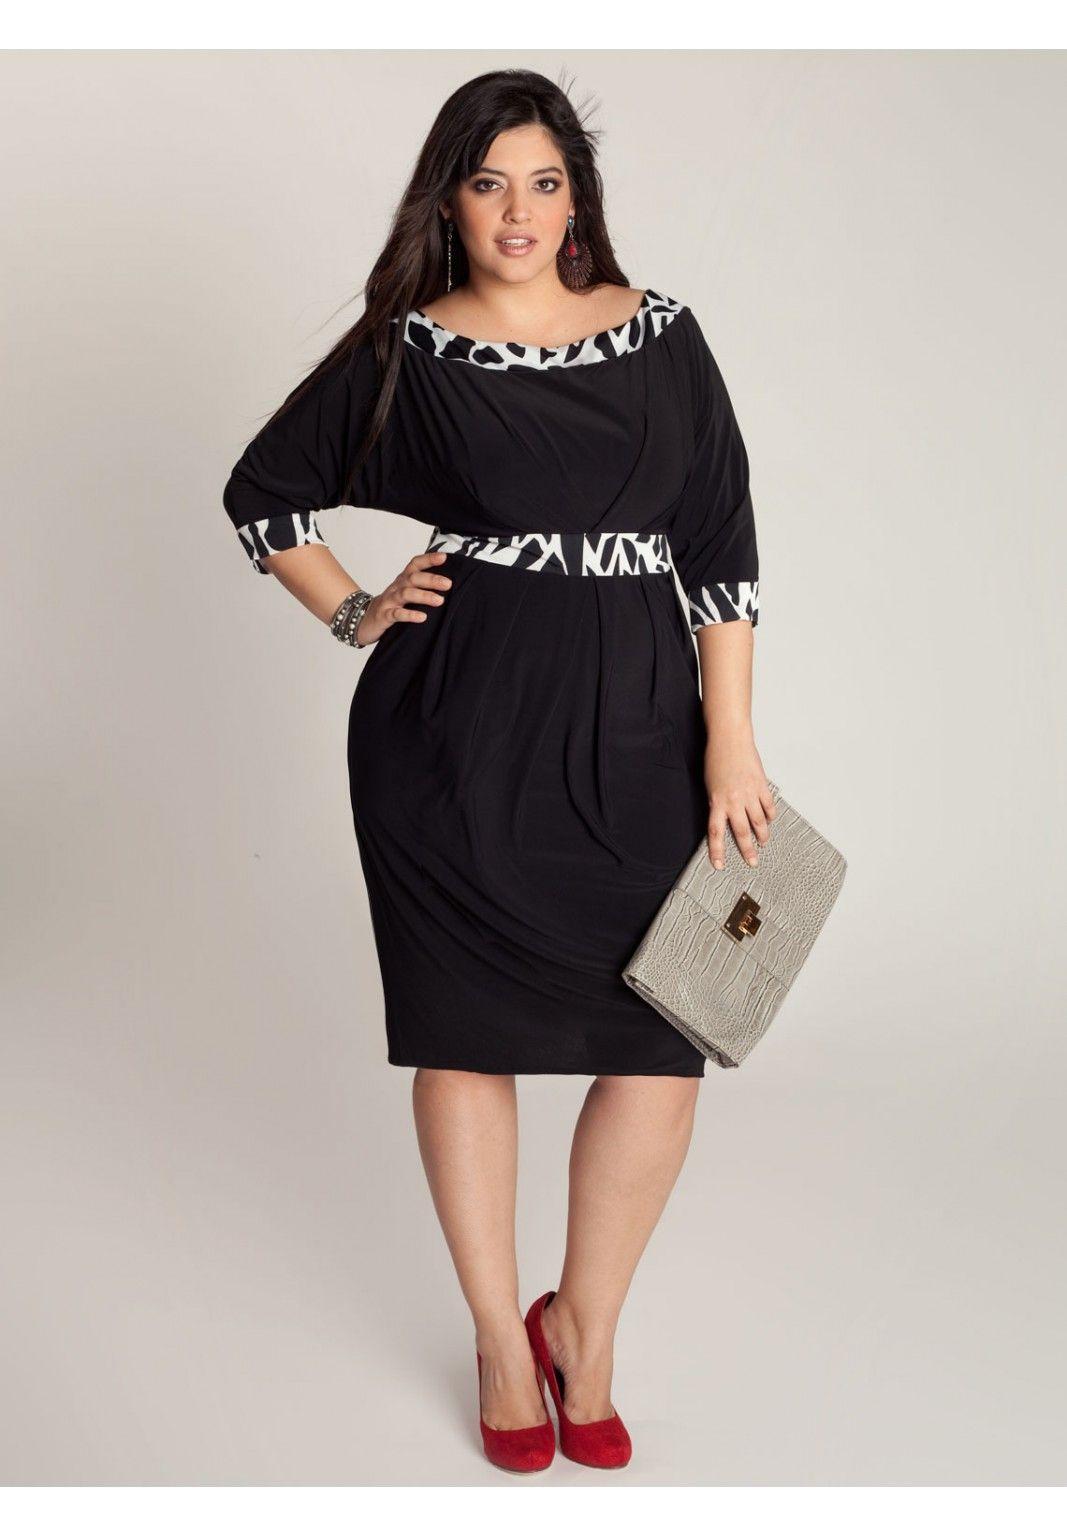 Plus Size Attiva Dress Love This Curvy Girl Fashion Plus Size Outfits Fashion